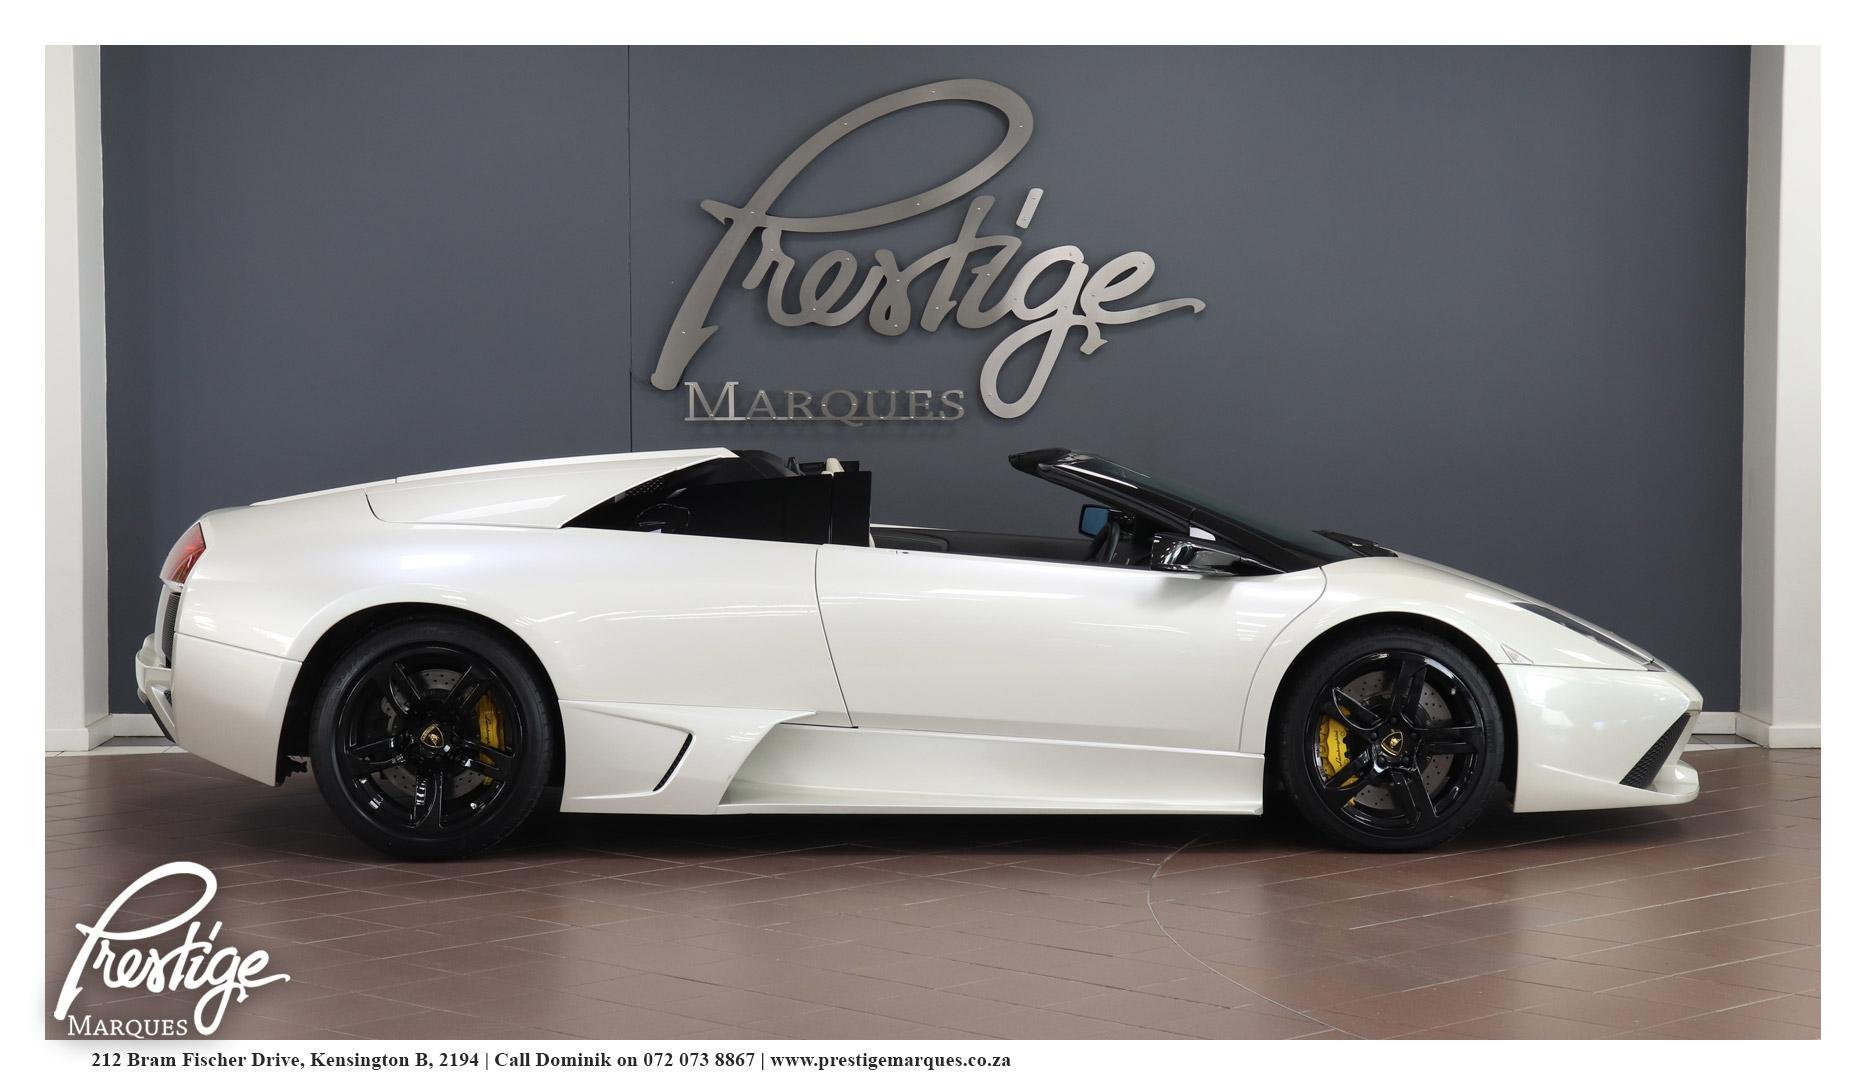 1-2008-Lamborghini-Murcielago-Roadster-LP640-E-Gear-Prestige-Marques-Randburg-Sandton-2